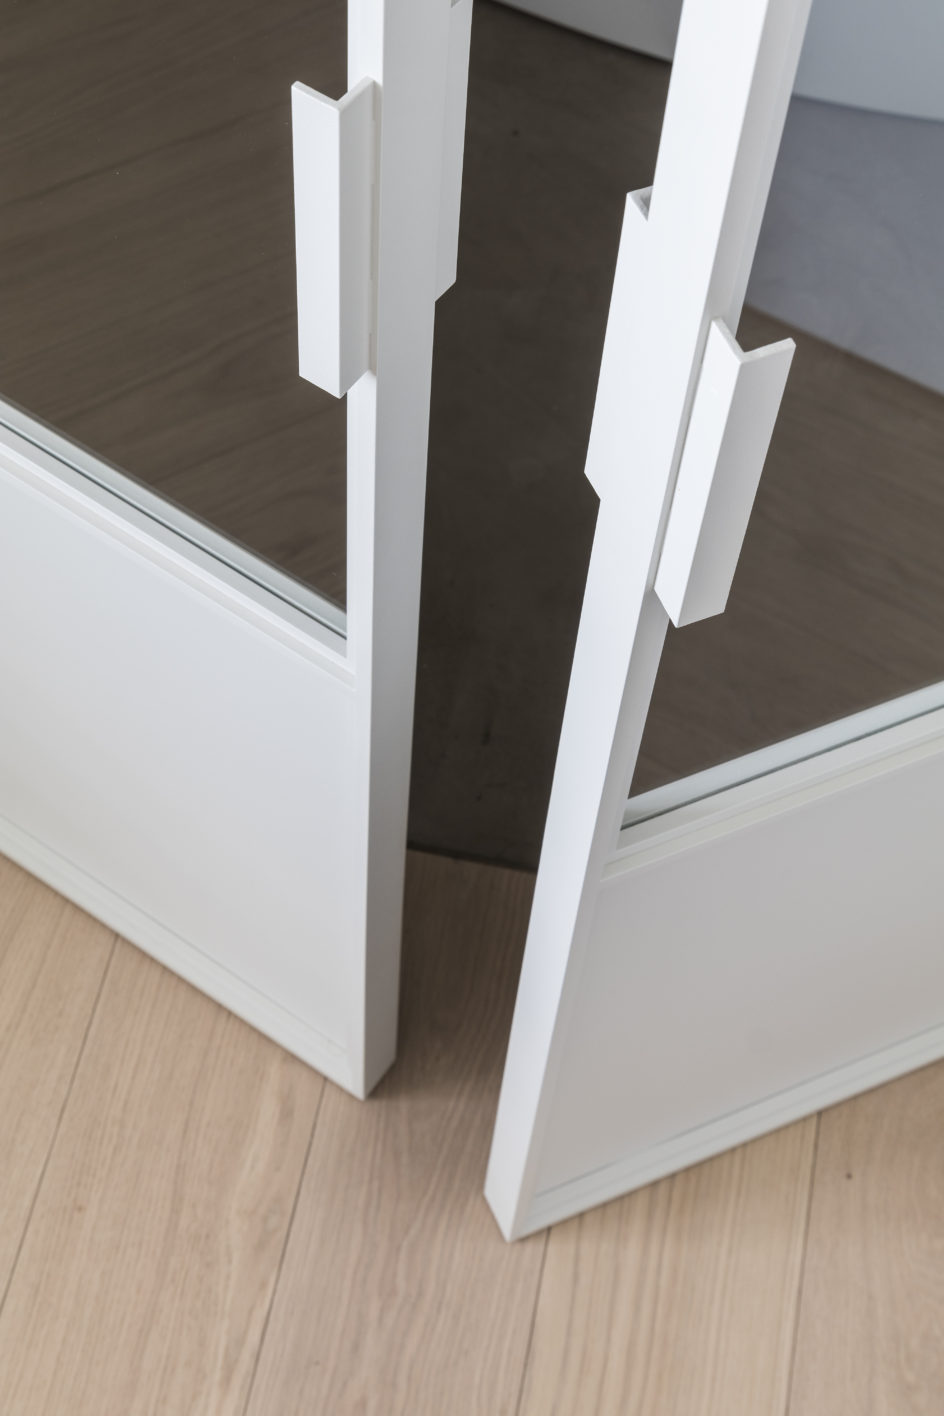 dubbel opendraaiende stalen deur, wit gelakt, ontwerp interieurarchitecte Marie Lecluyse